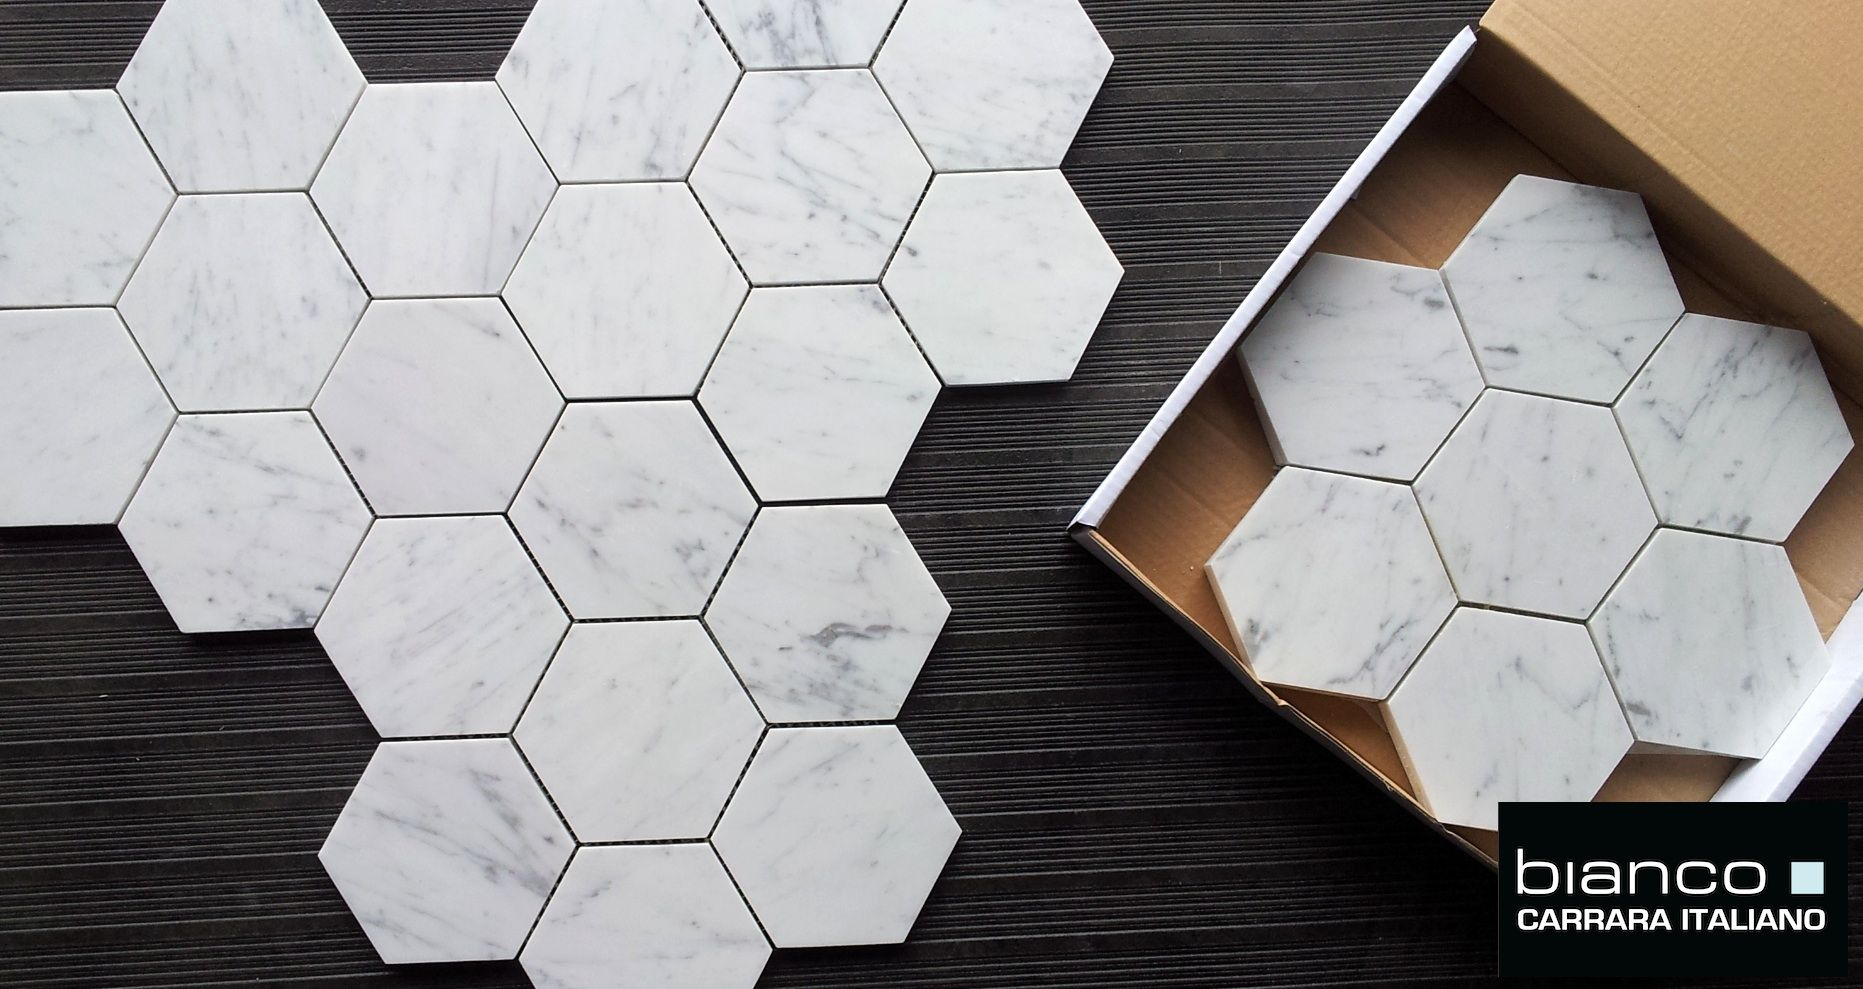 Carrara Bianco Hexagon Marble Mosaic Tile New House Pinterest - 5x5 mirror tiles